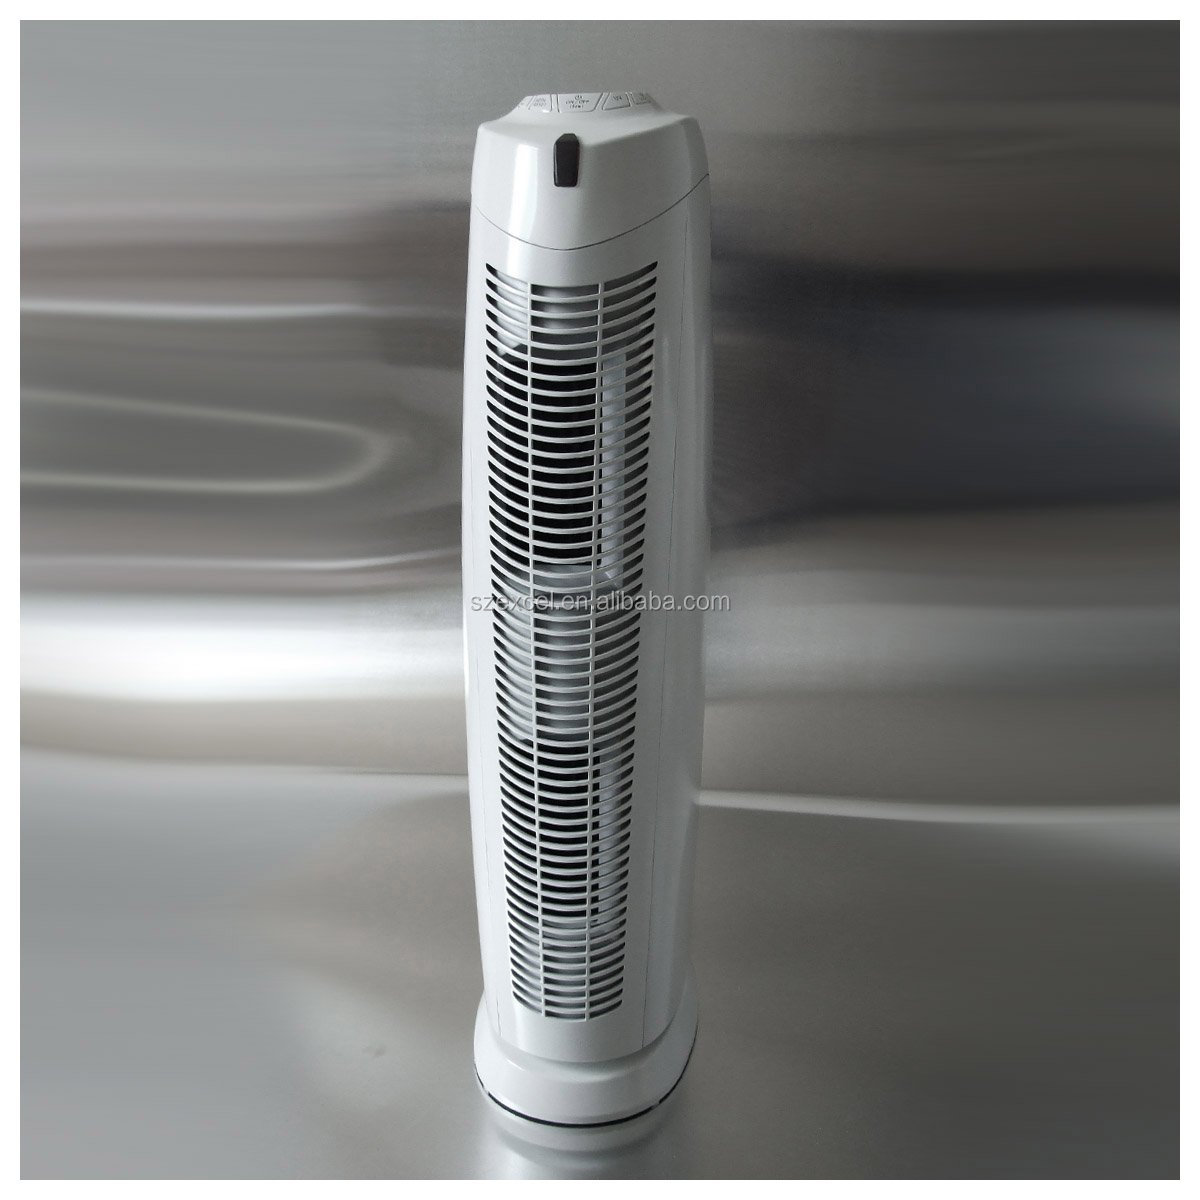 germicidal uv lamp air purifier china buy germicidal uv lamp air. Black Bedroom Furniture Sets. Home Design Ideas